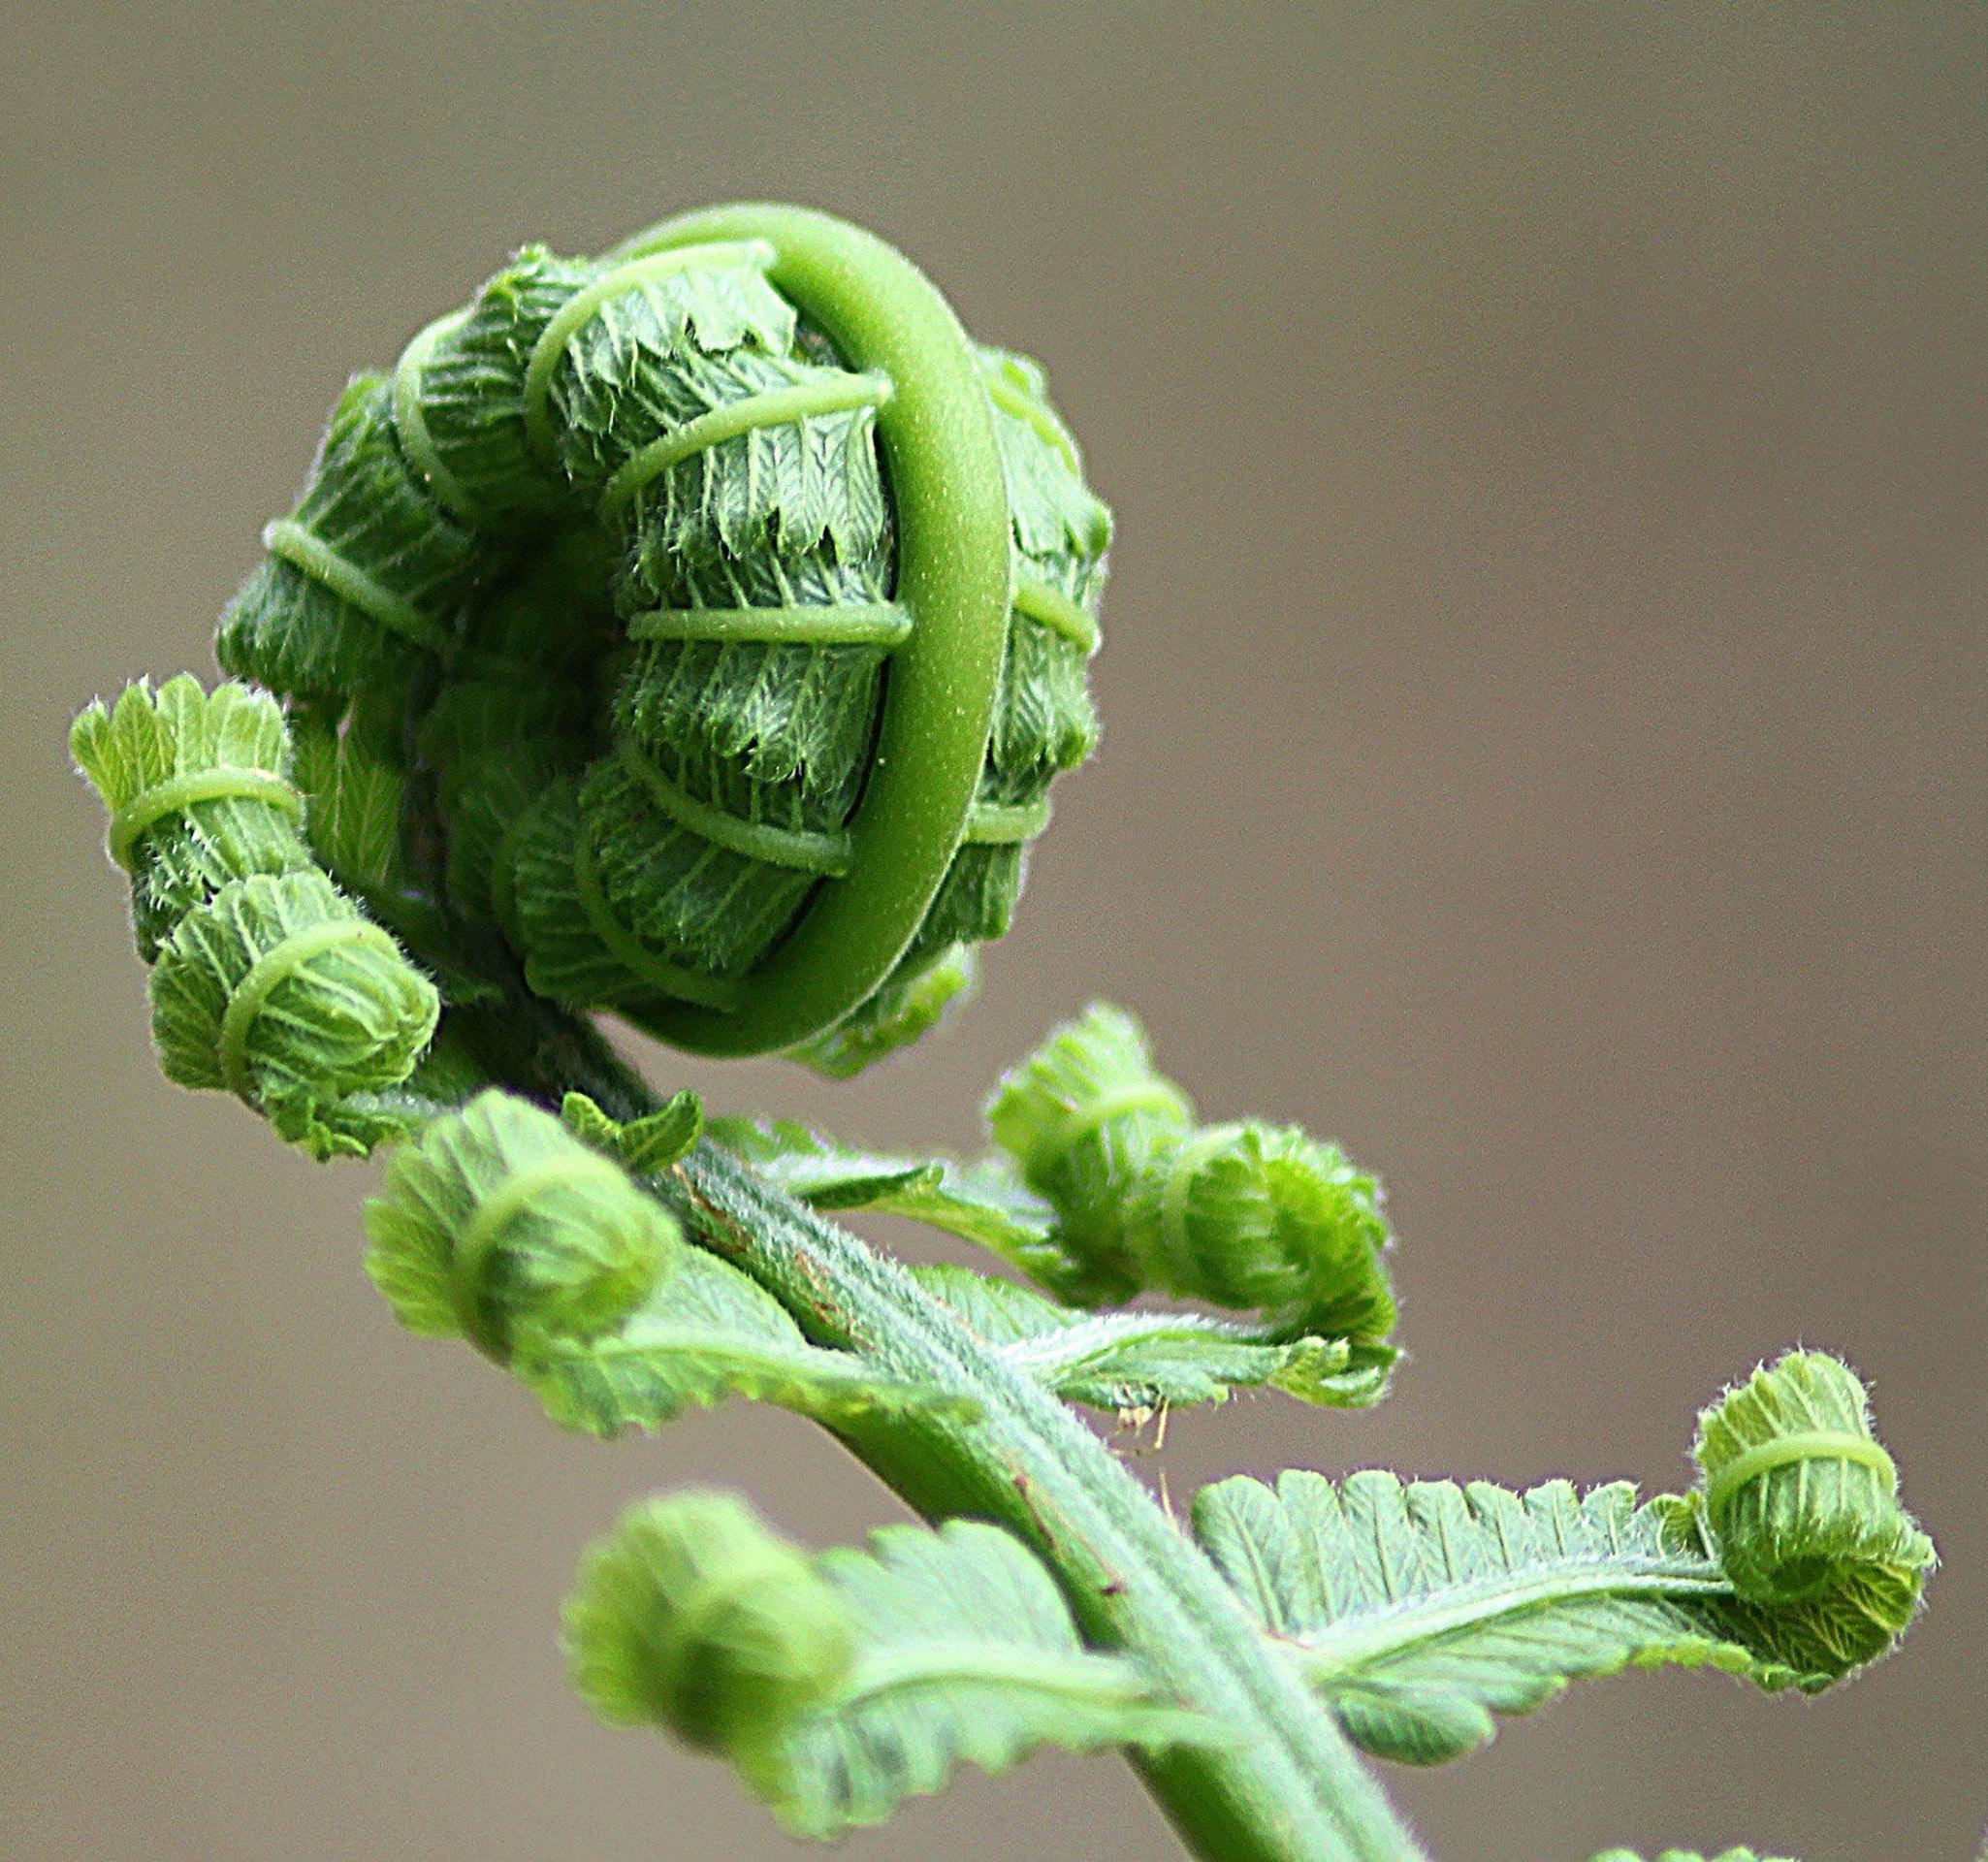 green fern about to unfurl